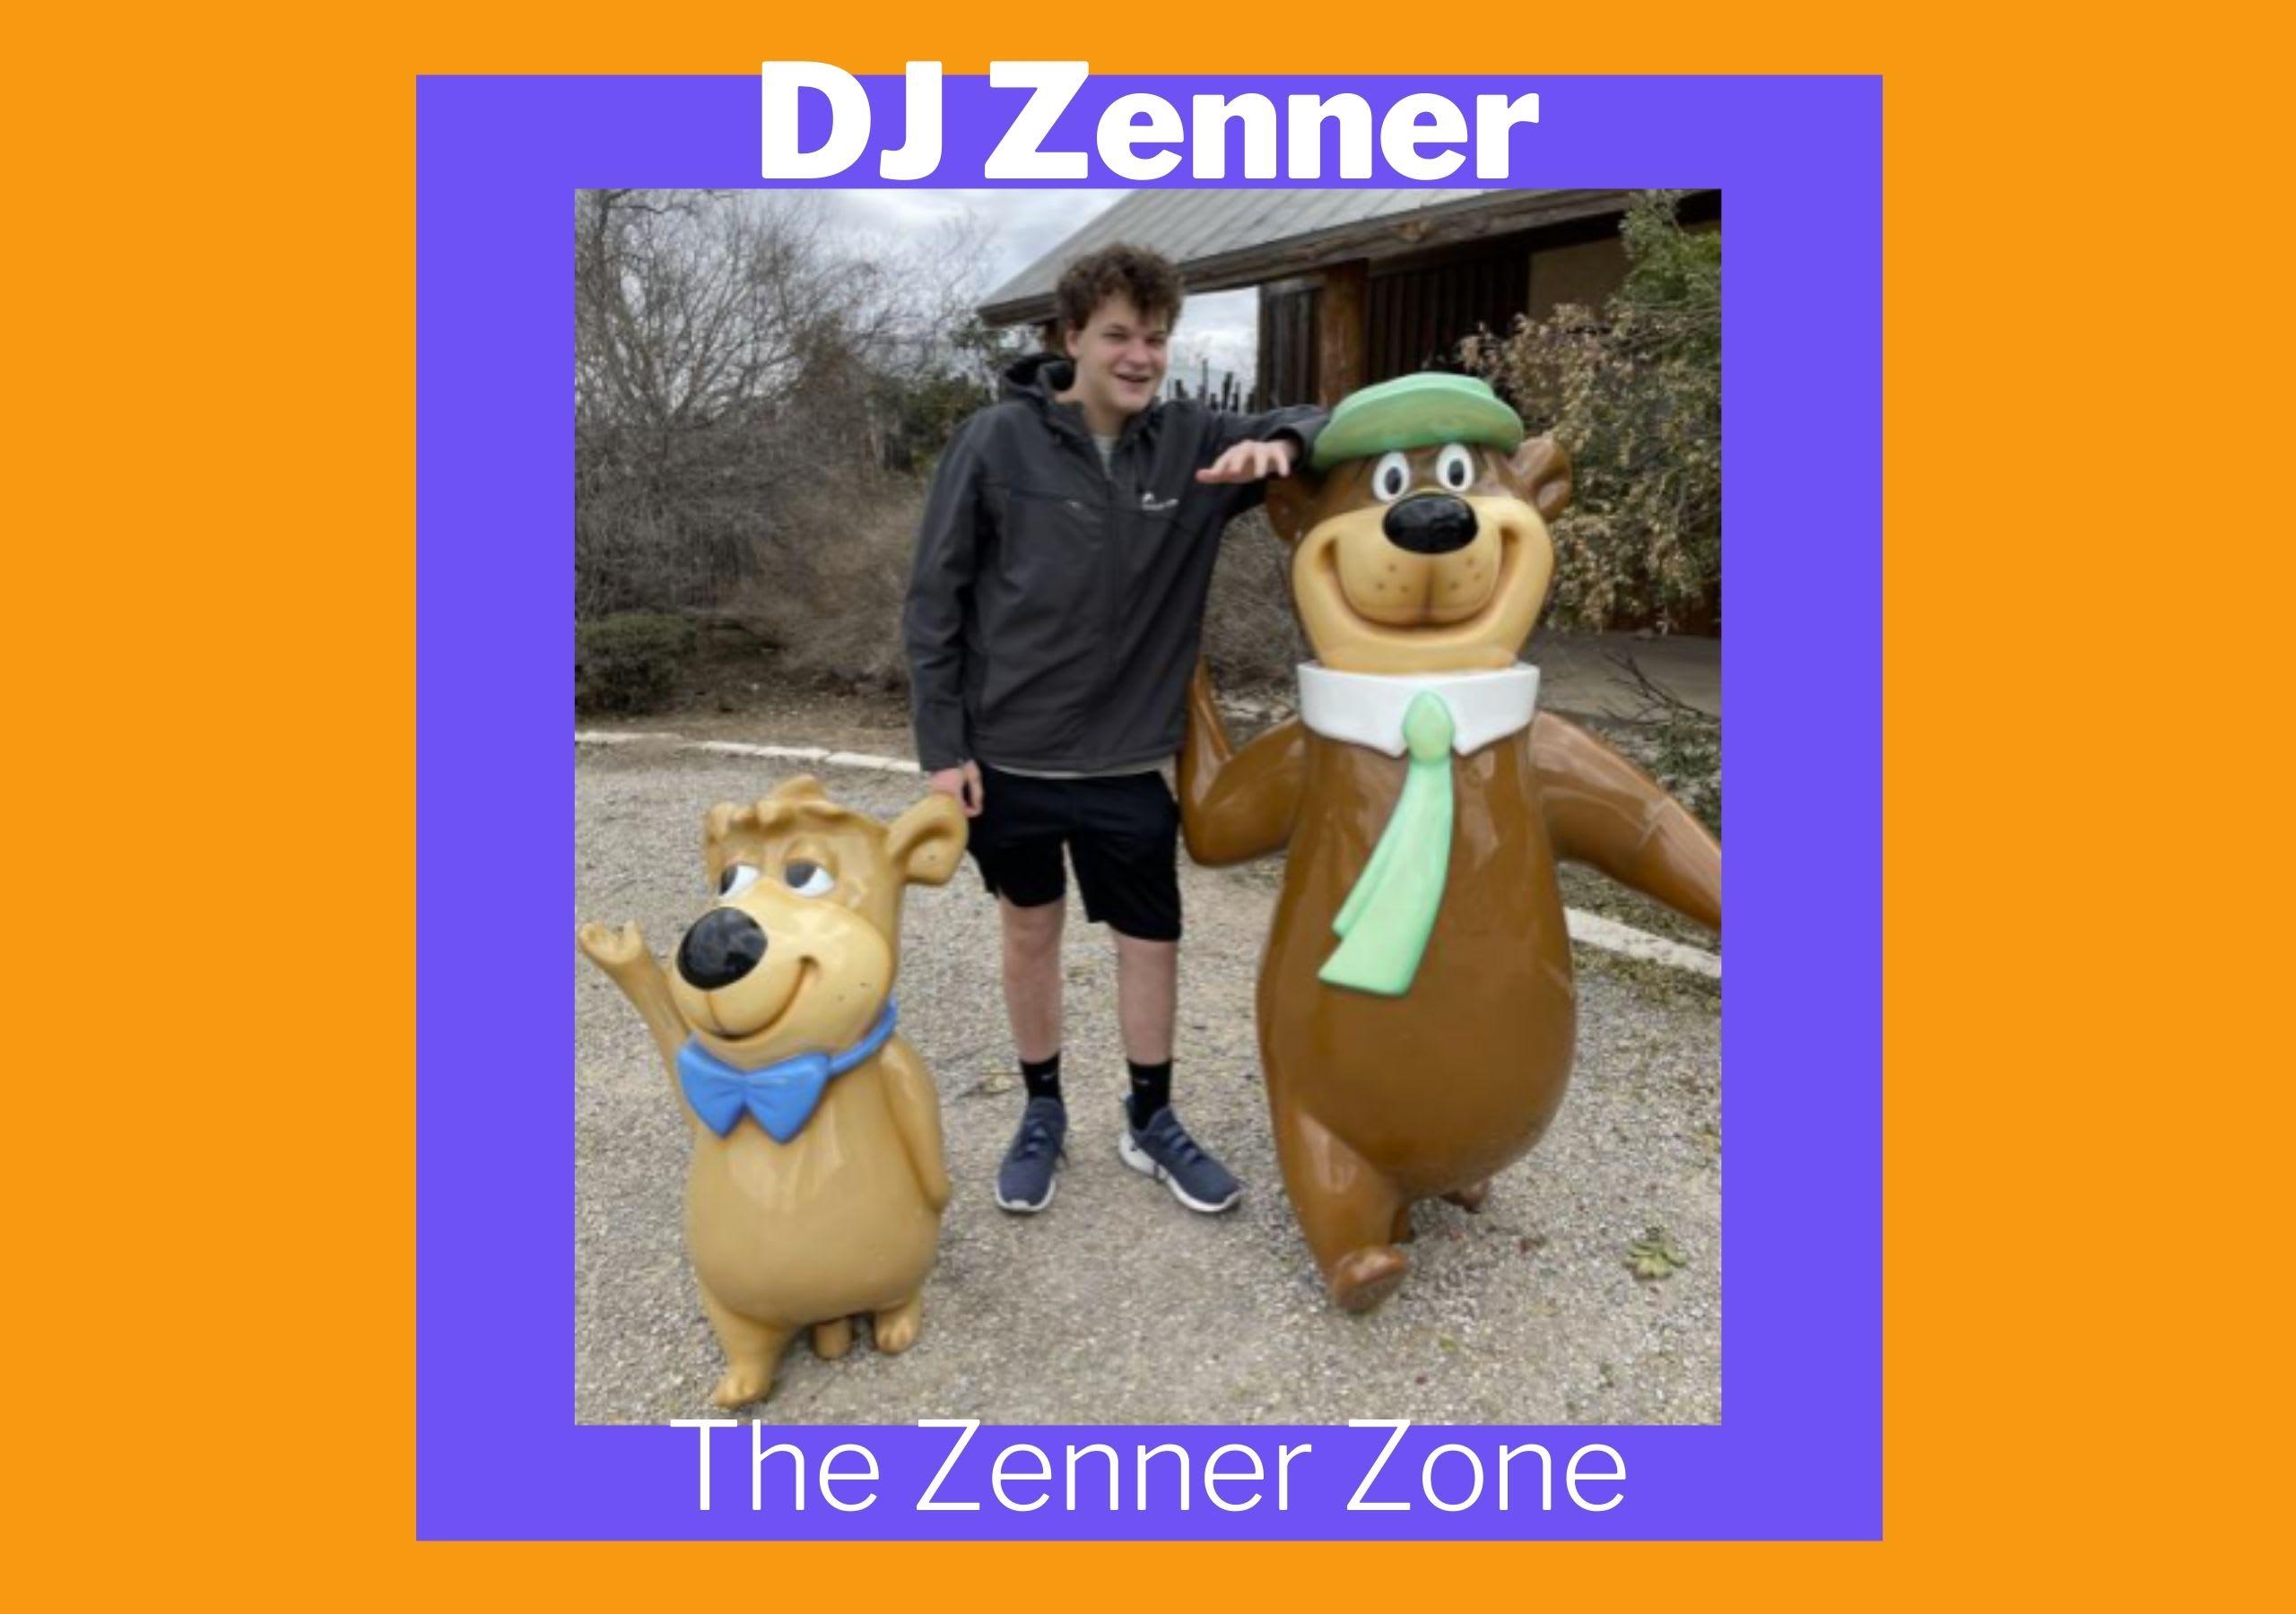 Show Spotlight: The Zenner Zone with DJ Zenner